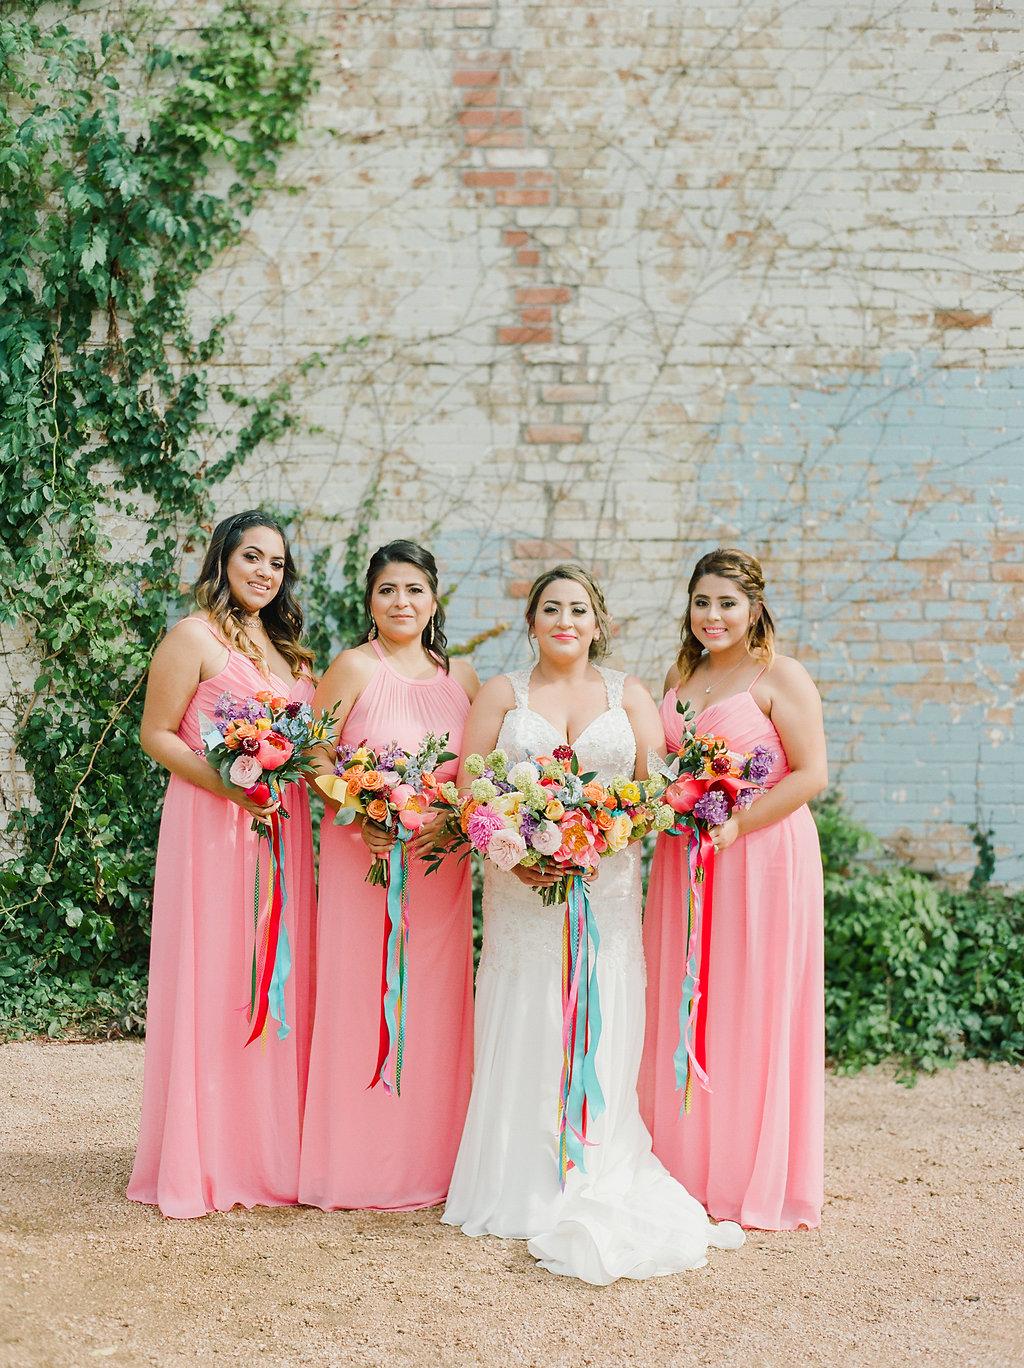 colorful bridal party ideas - https://ruffledblog.com/modern-playful-texas-carnival-wedding